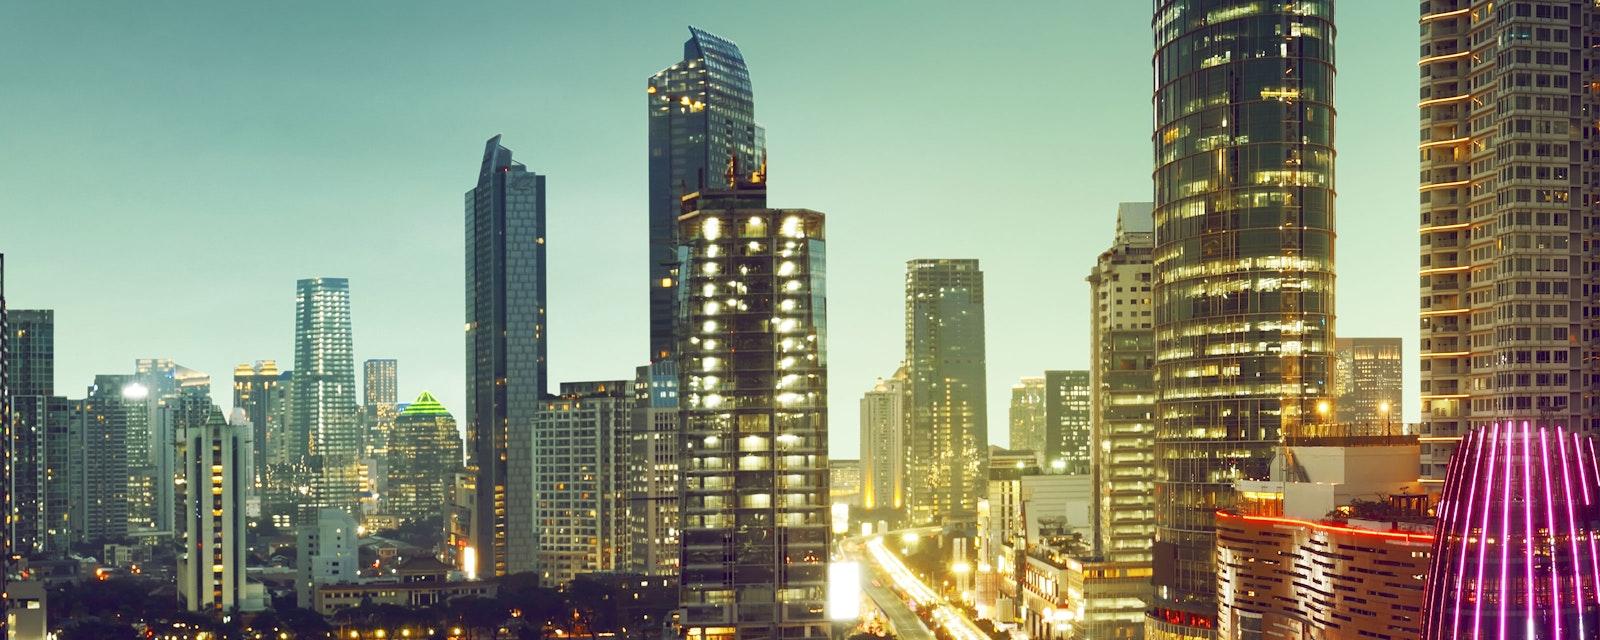 Cityspe of Jakarta City